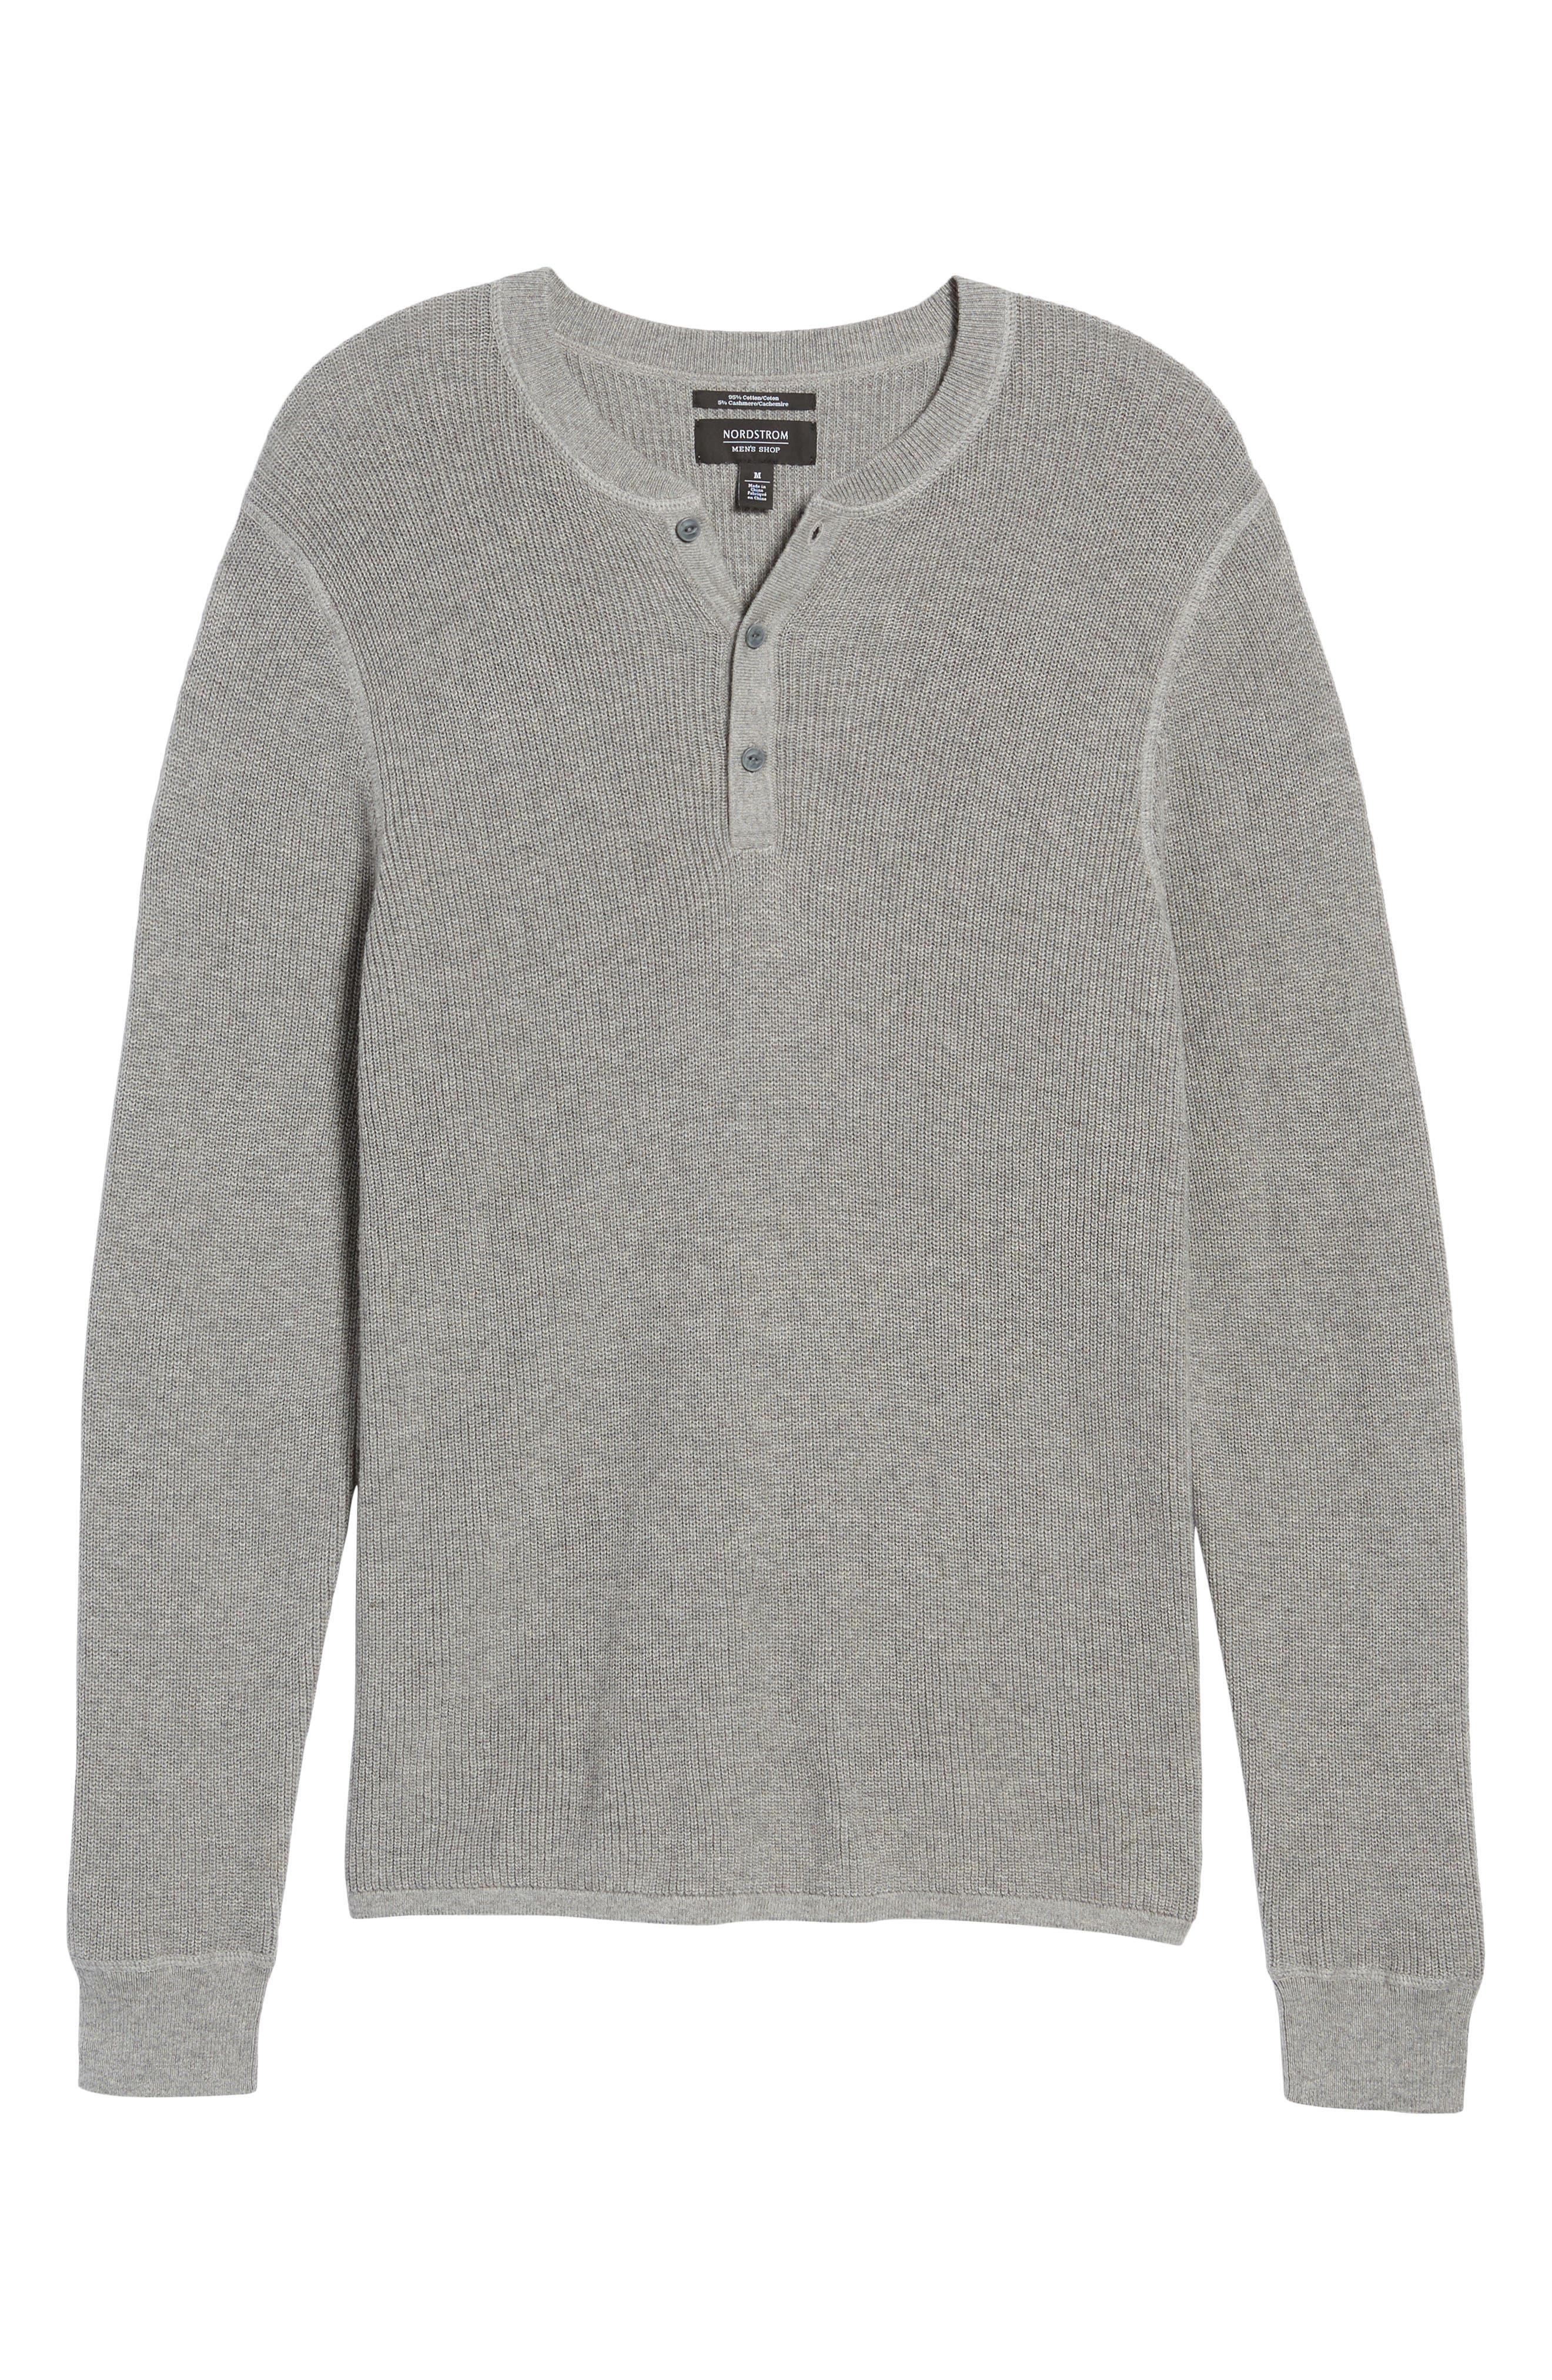 Cotton & Cashmere Henley Sweater,                             Alternate thumbnail 6, color,                             030